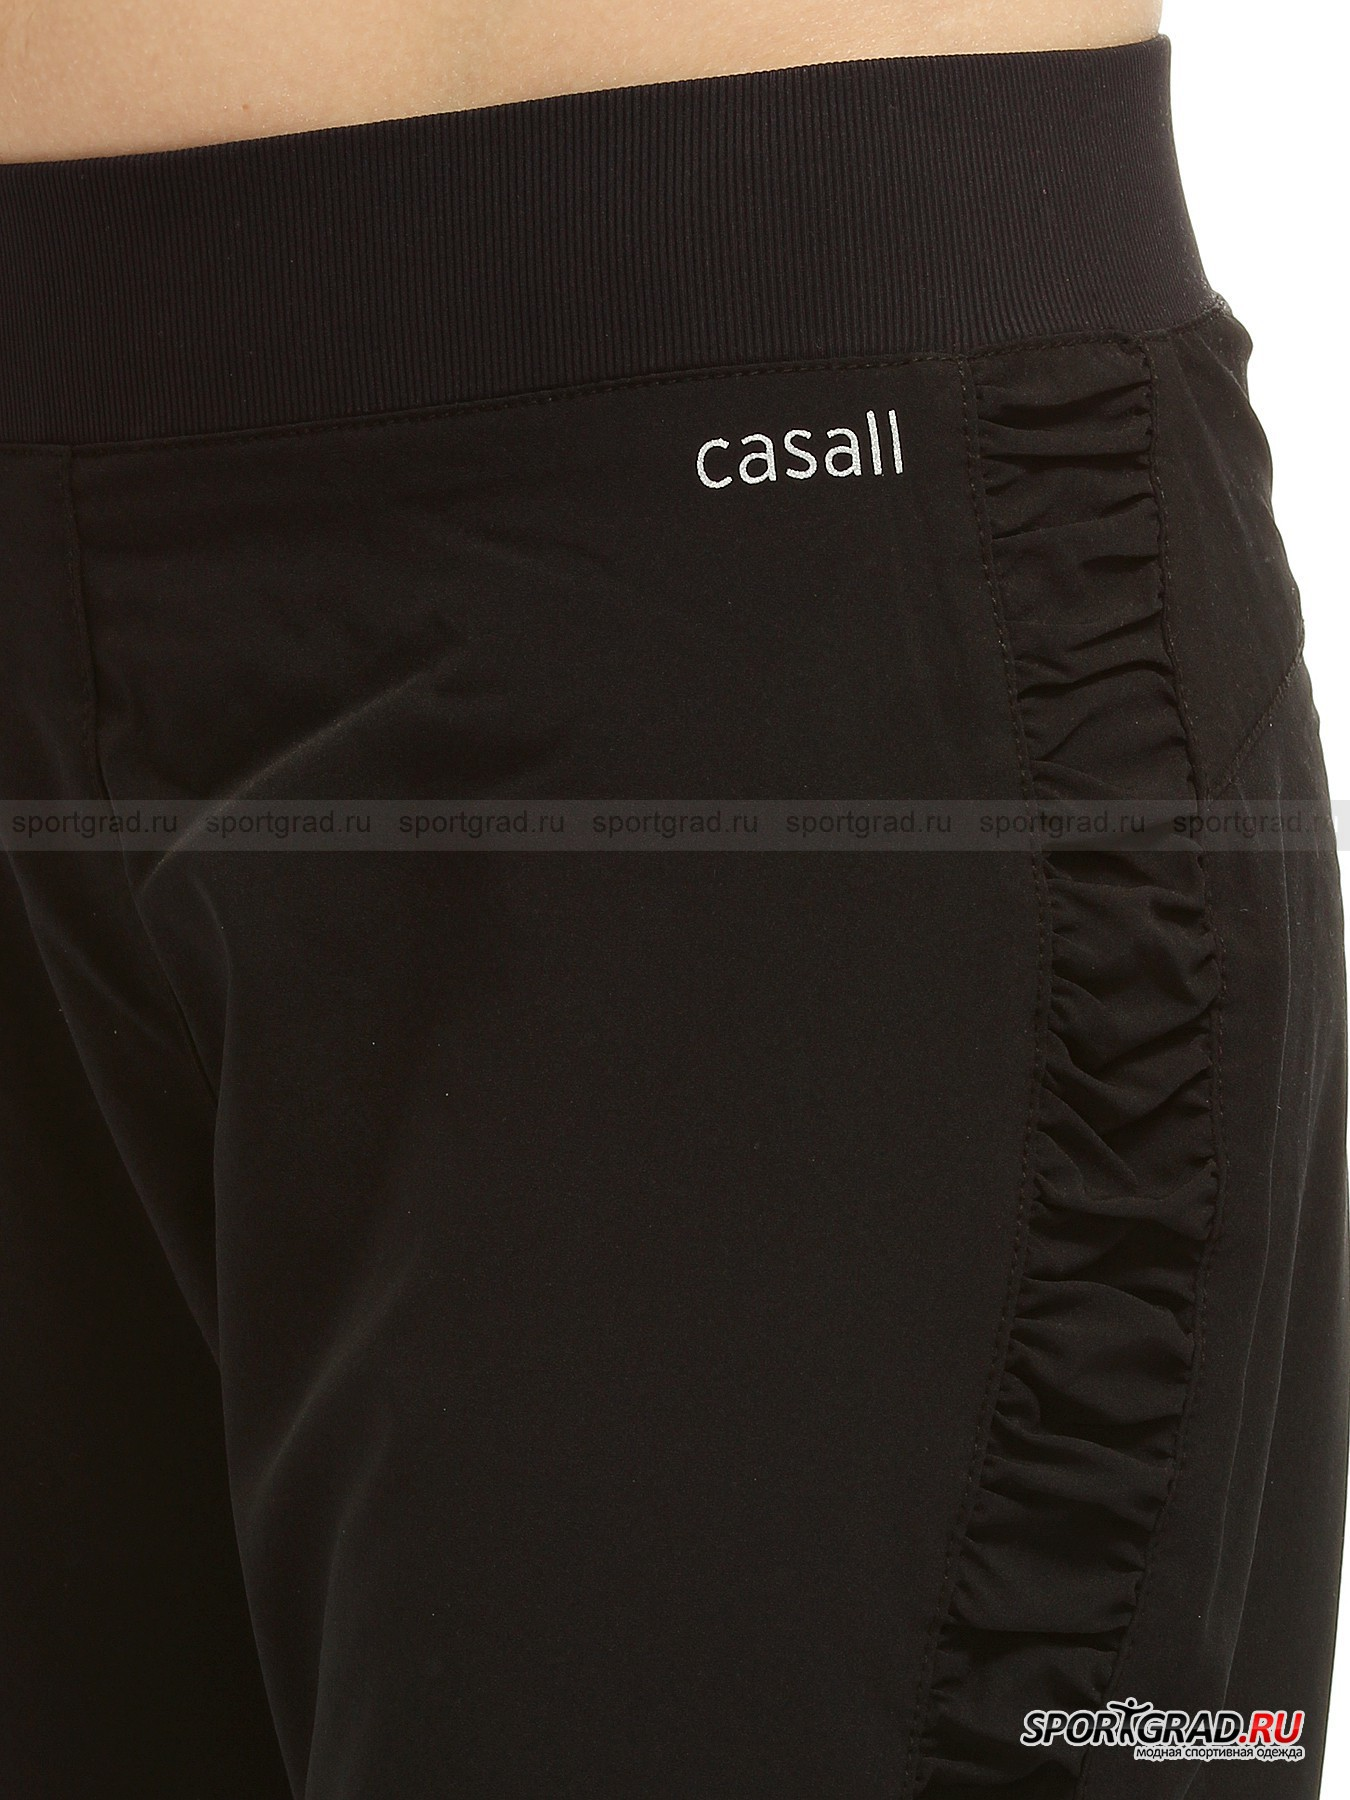 Брюки женские для танцев и фитнеса Move cuff pants CASALL от Спортград